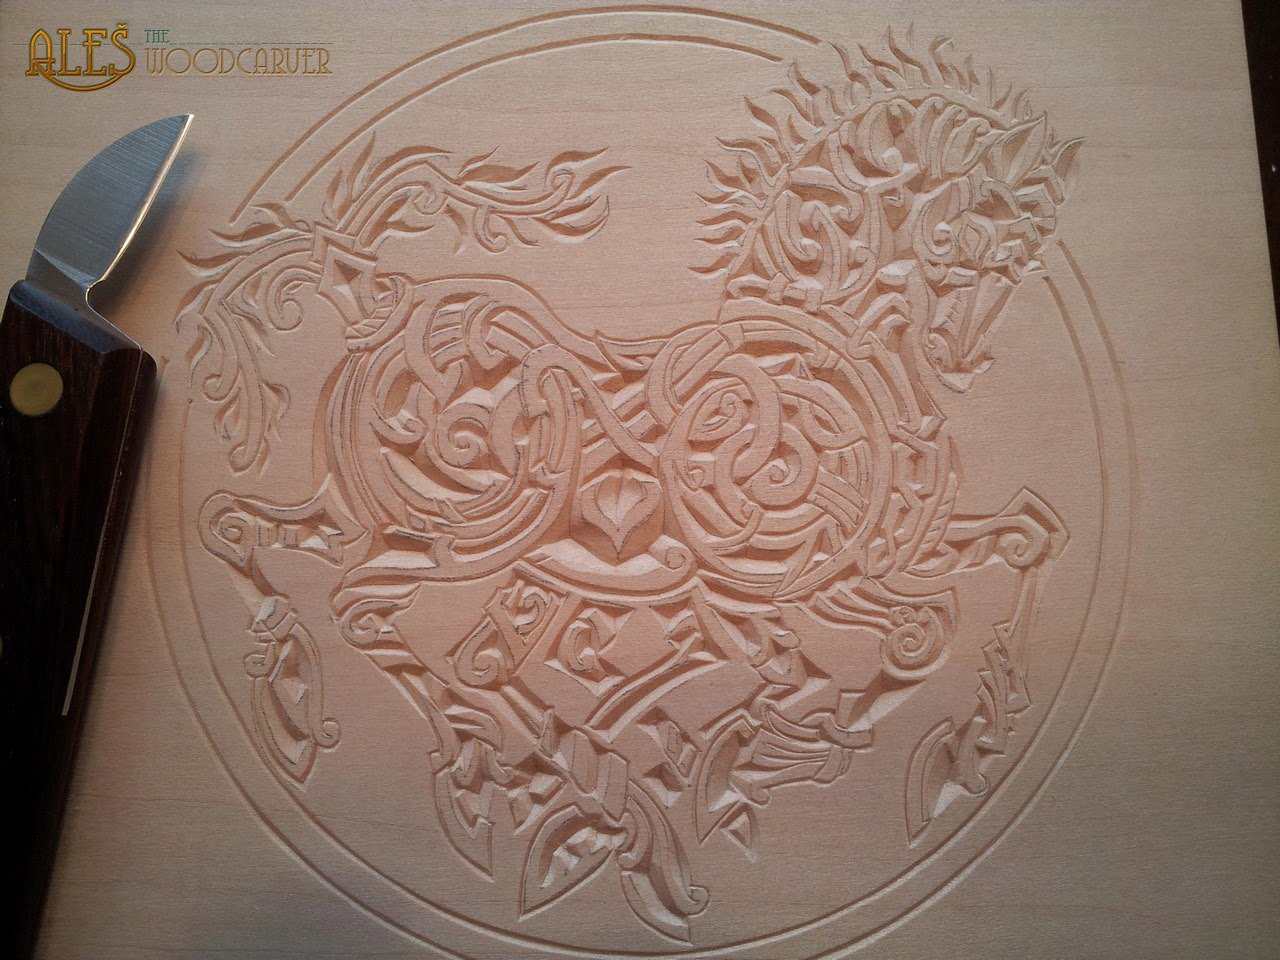 Ales the woodcarver chip carved sleipnir trinket box